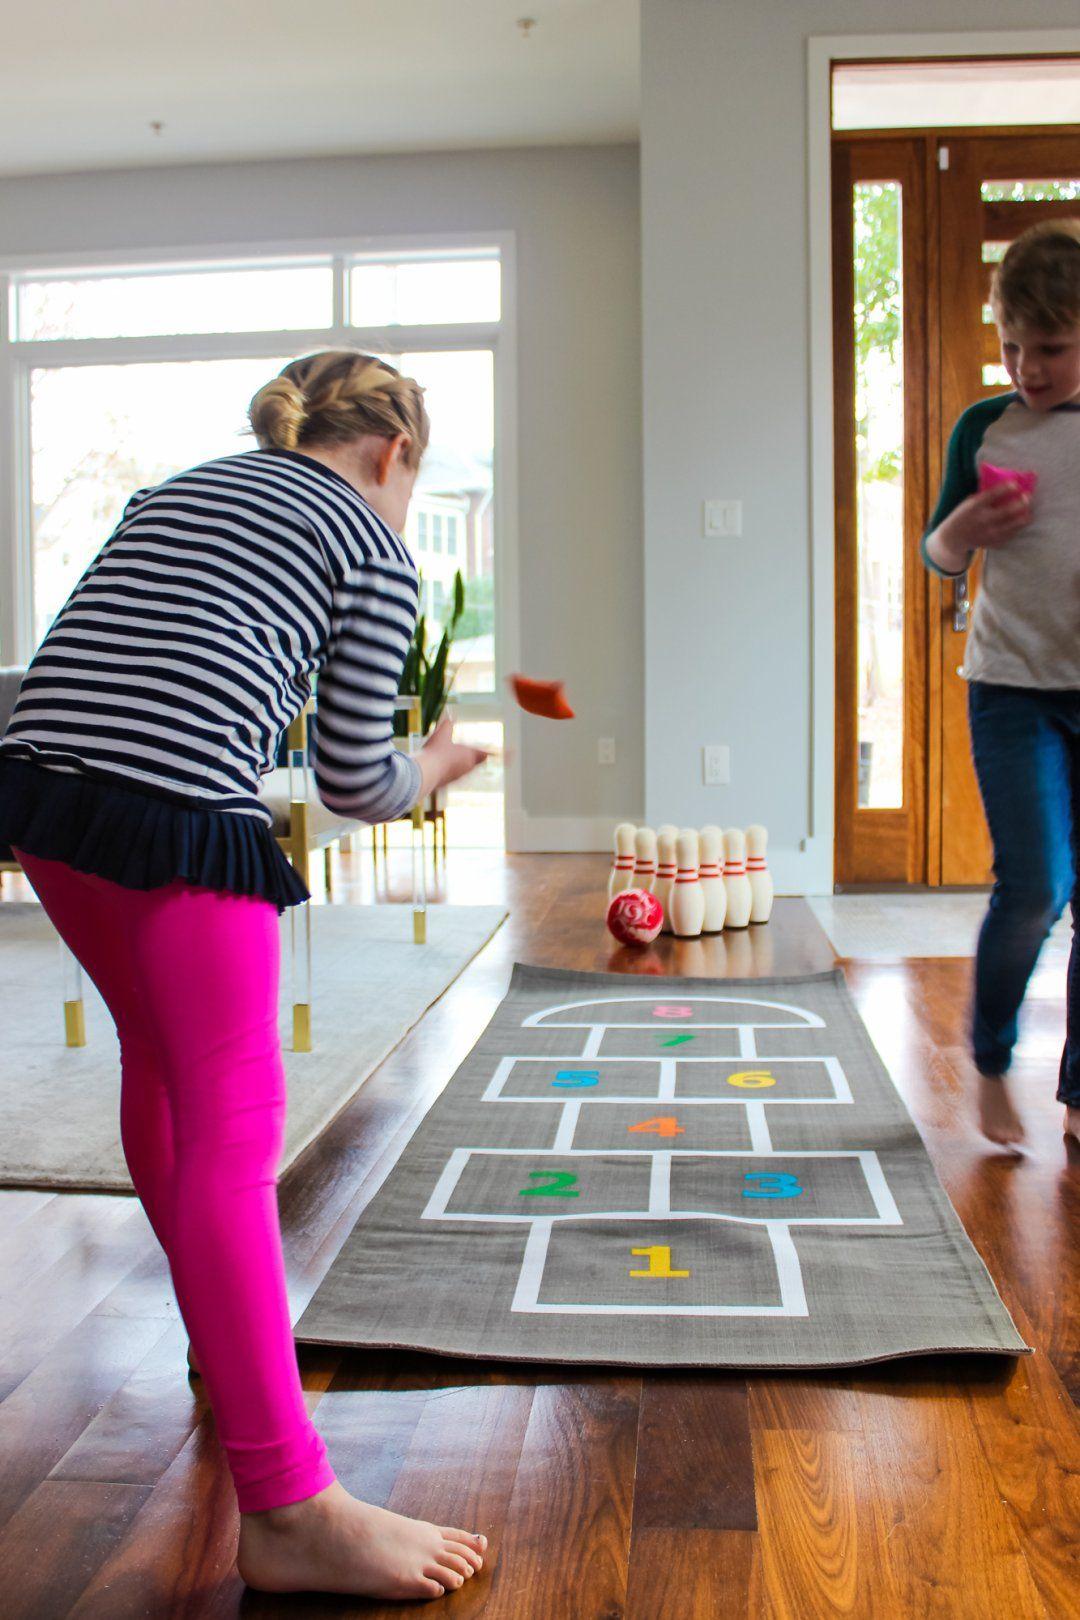 Exceptionnel Shop Livingroom Lanes Bowling Set   Land Of Nod Games U0026 Puzzles   Kids U0026  Baby Furniture, Bedding And Toys, Hop, Skip And A Jump Playmat   Land Of  Nod Games ...